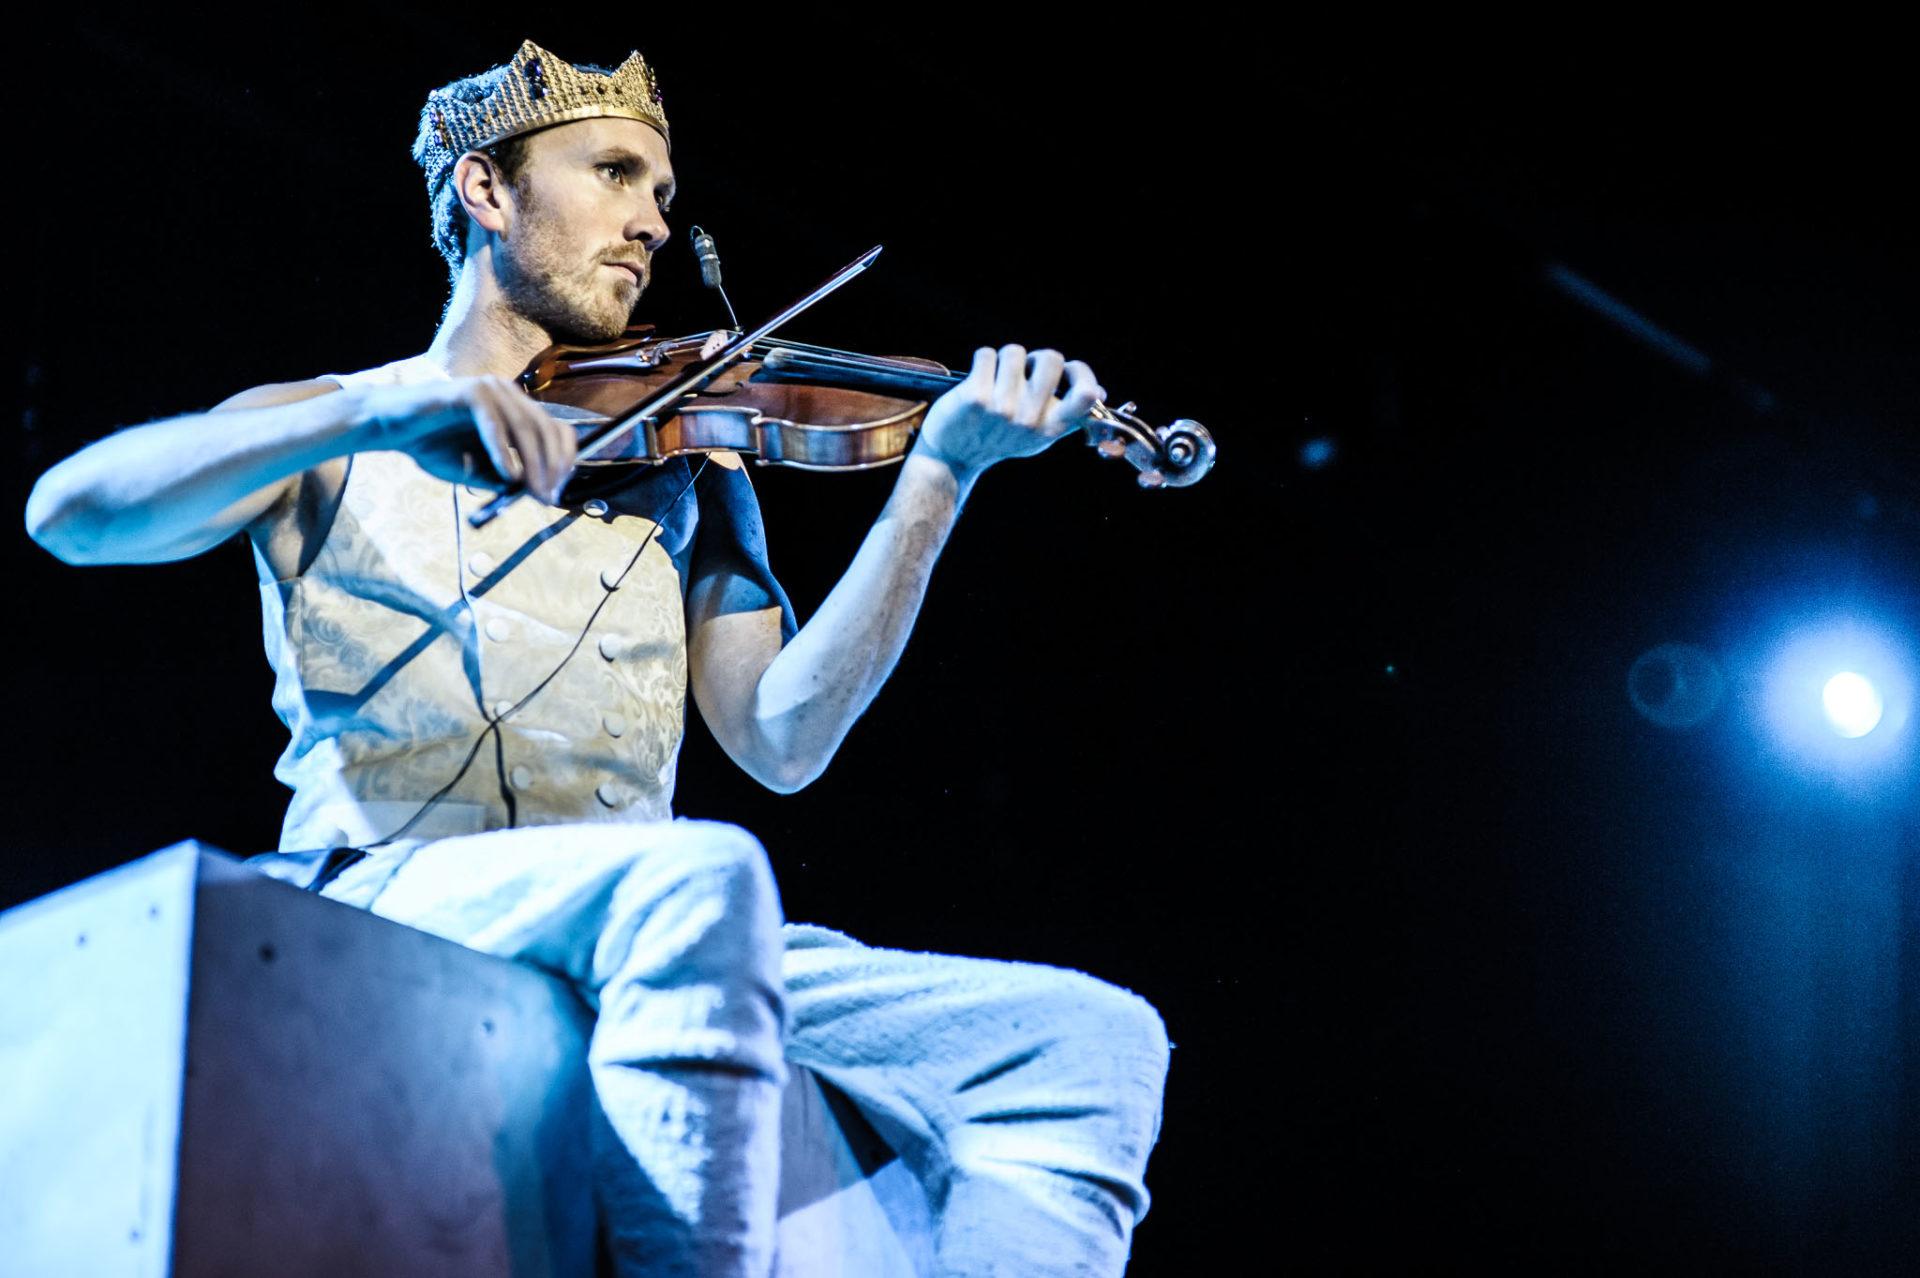 mann med krone spiller fiolin